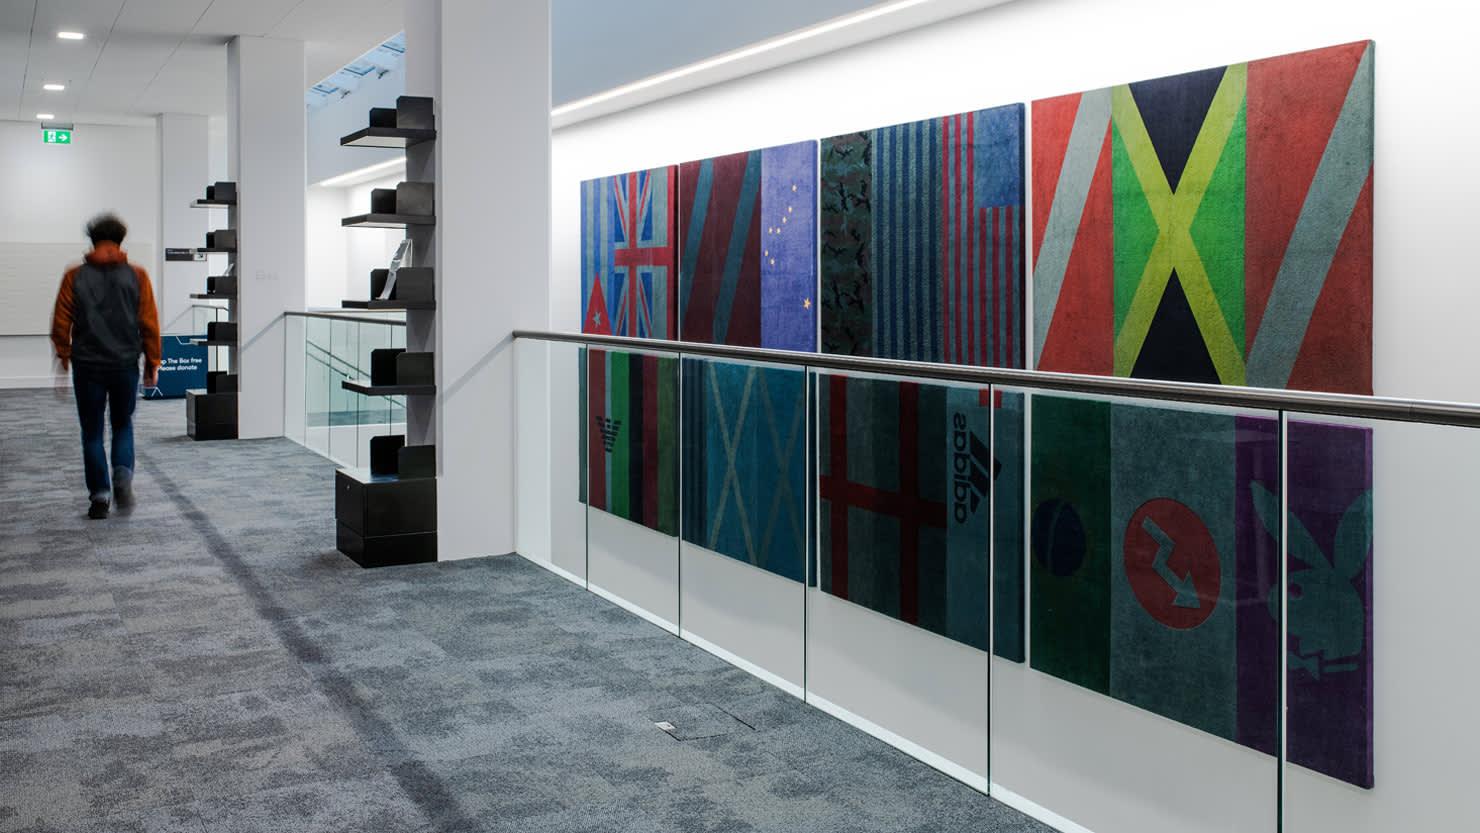 Affairs by Alexandre da Cunha on display at The Box, Plymouth